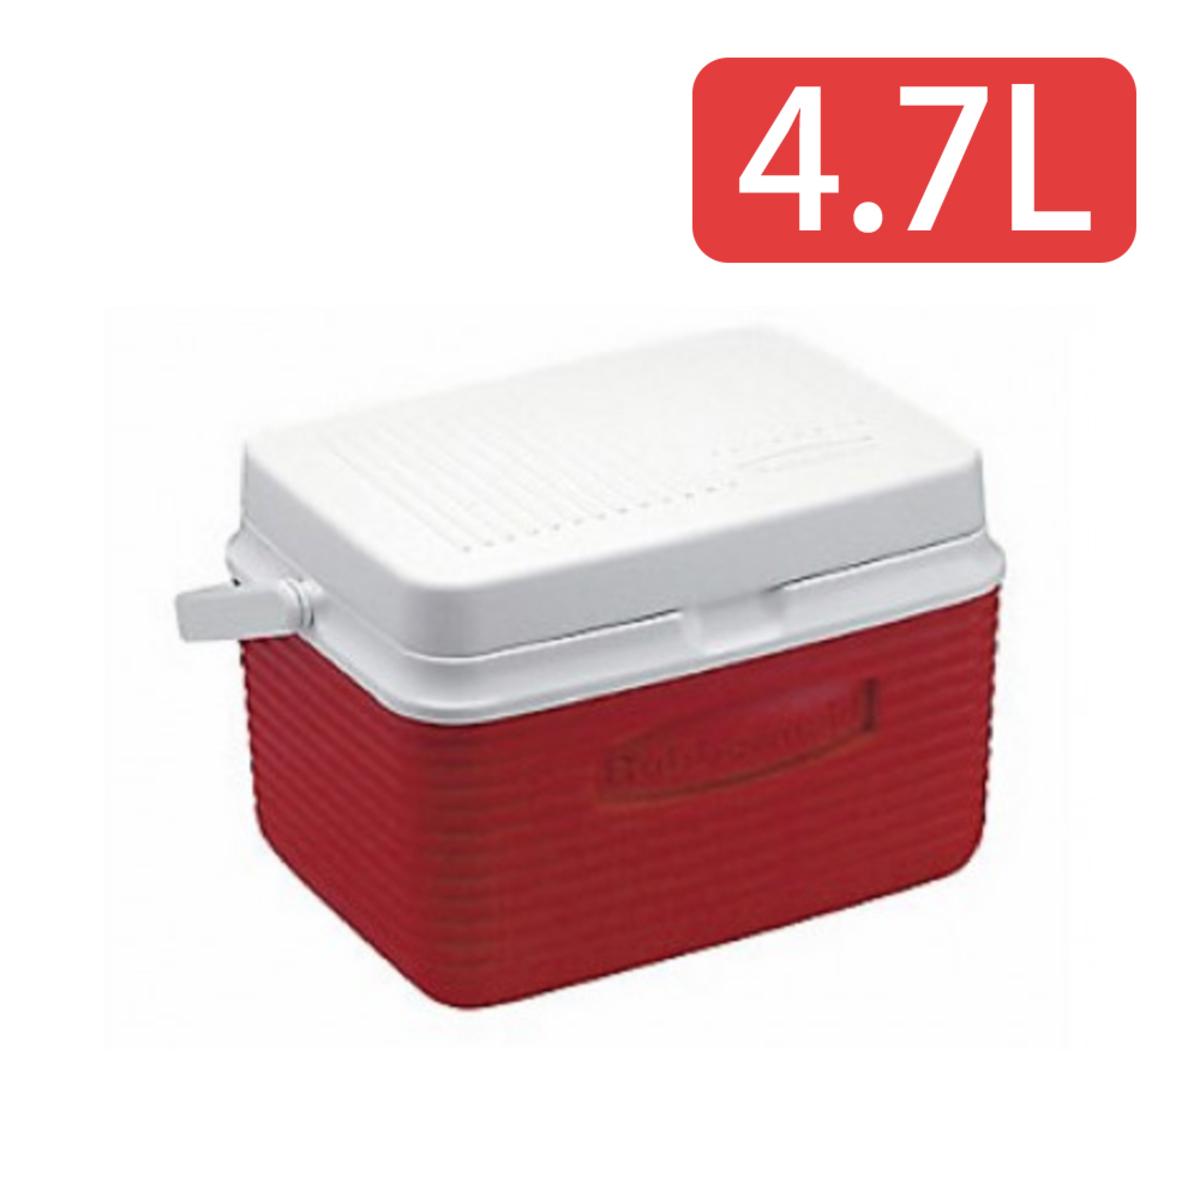 4.7L Cooler - 5QT (6 cans) (Red)